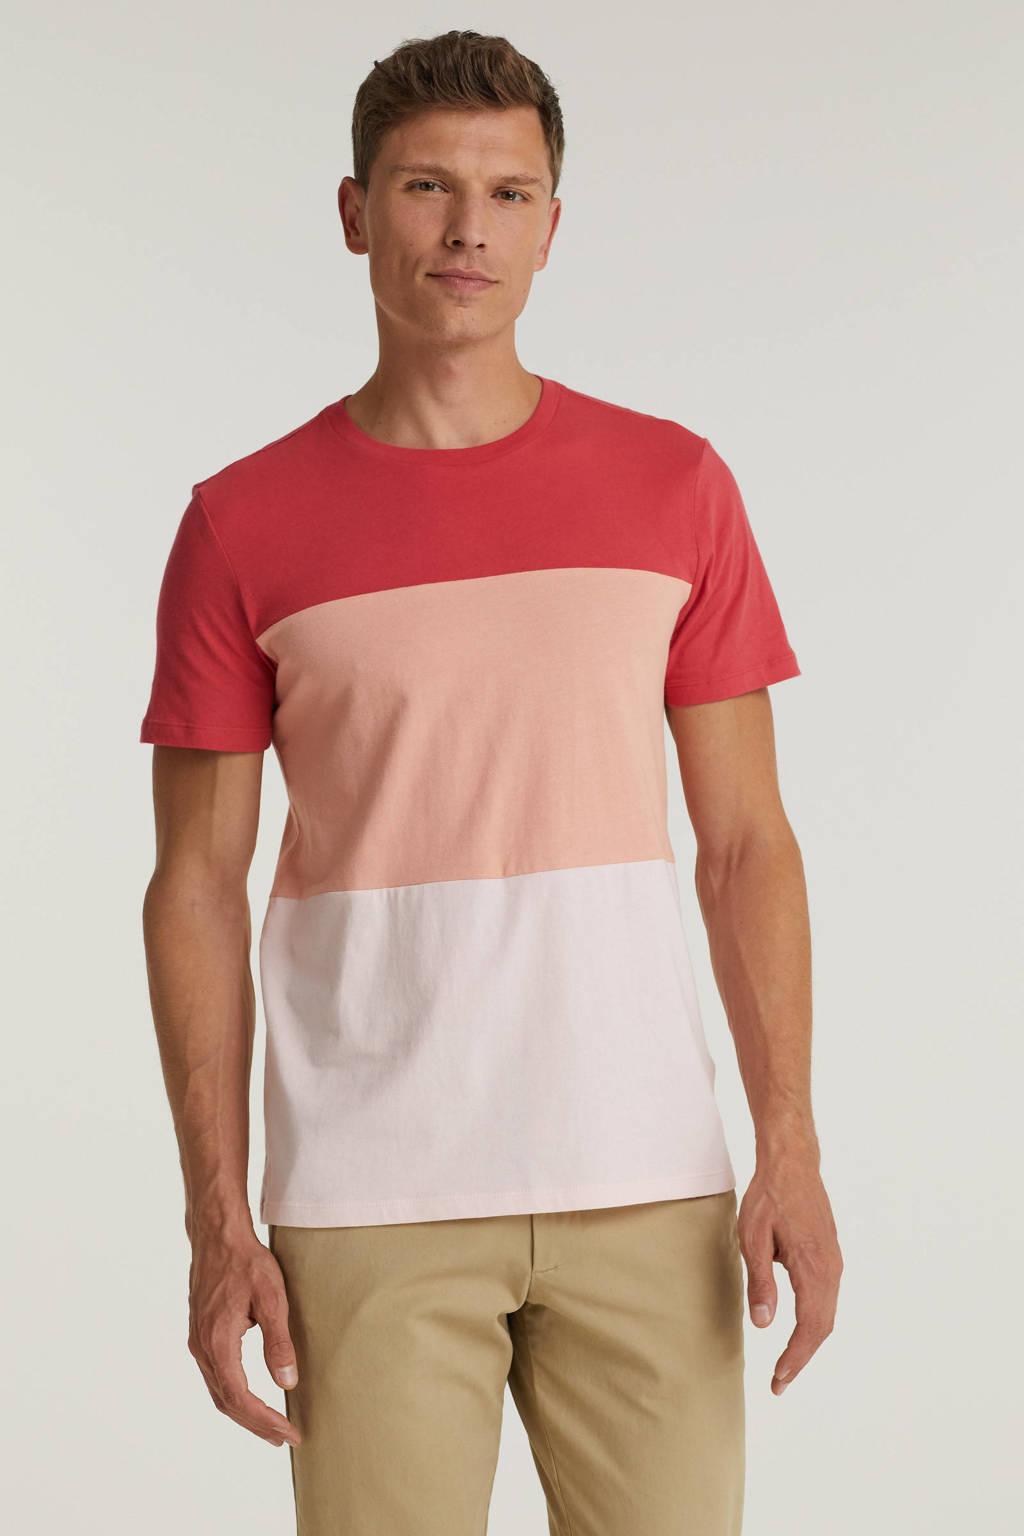 GAP T-shirt rood/roze, Rood/roze